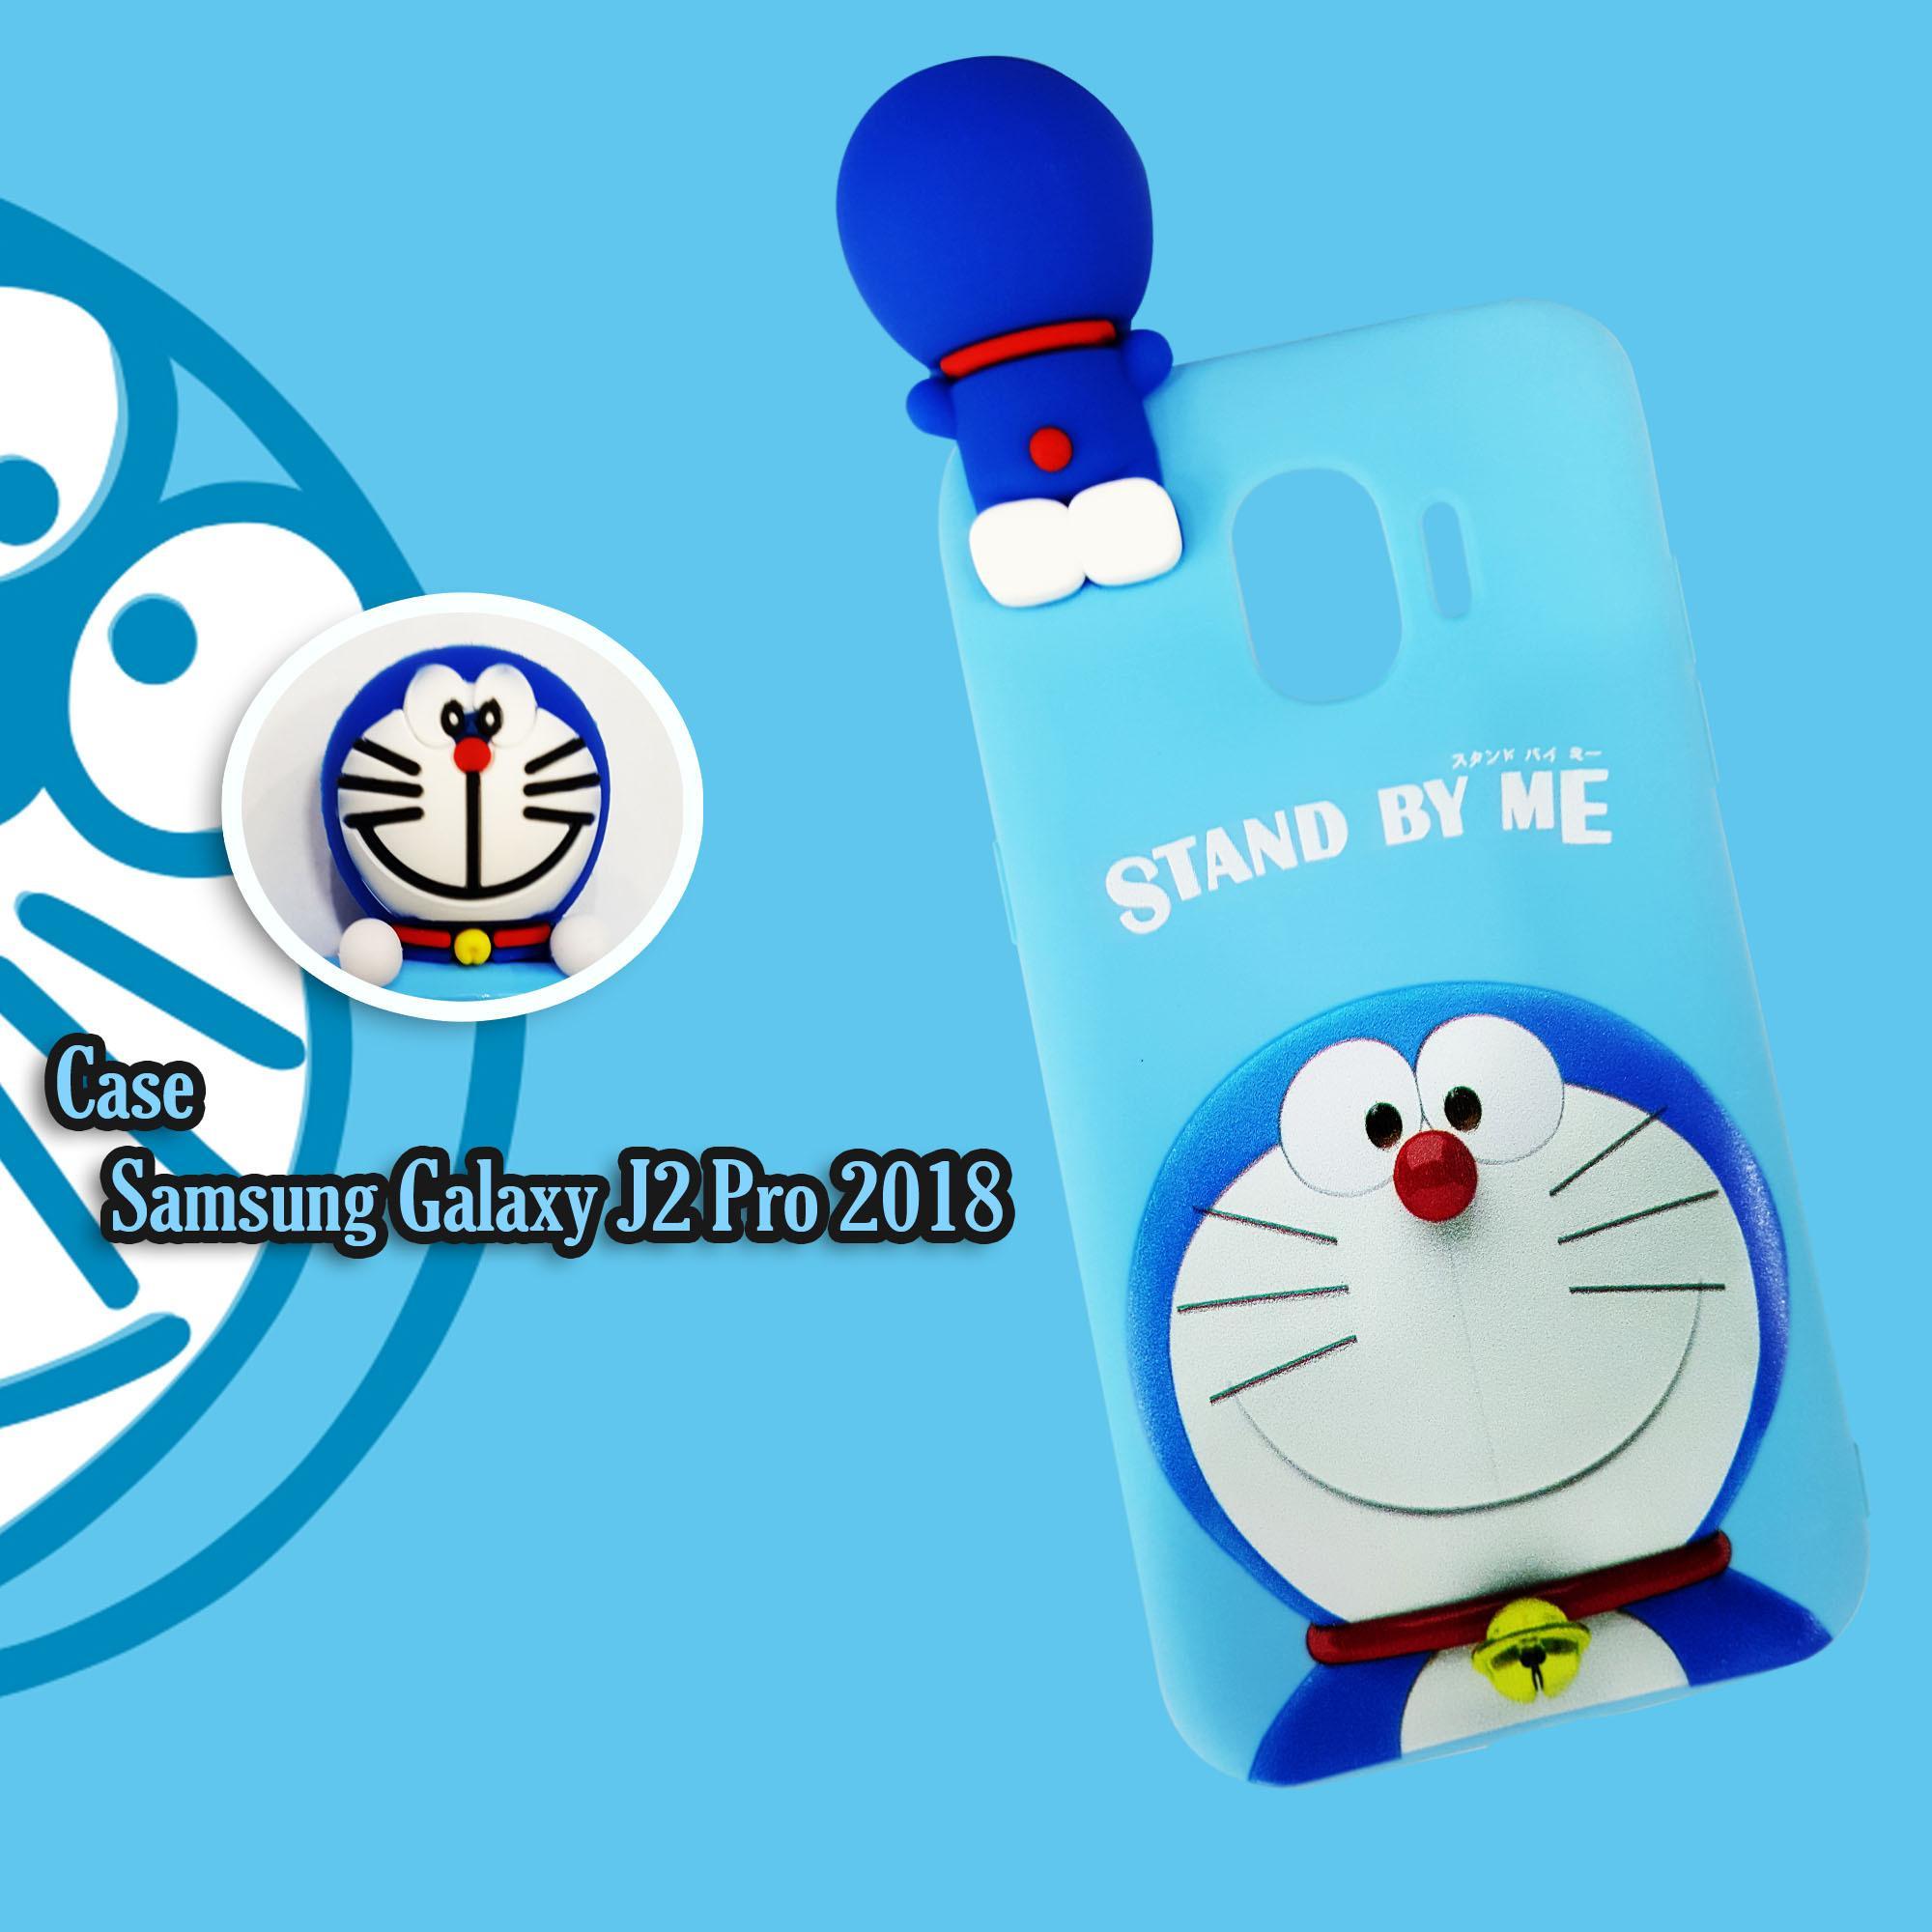 Cek Harga Baru Case Samsung Galaxy J2 Pro 2018 Doraemon Stand By Me